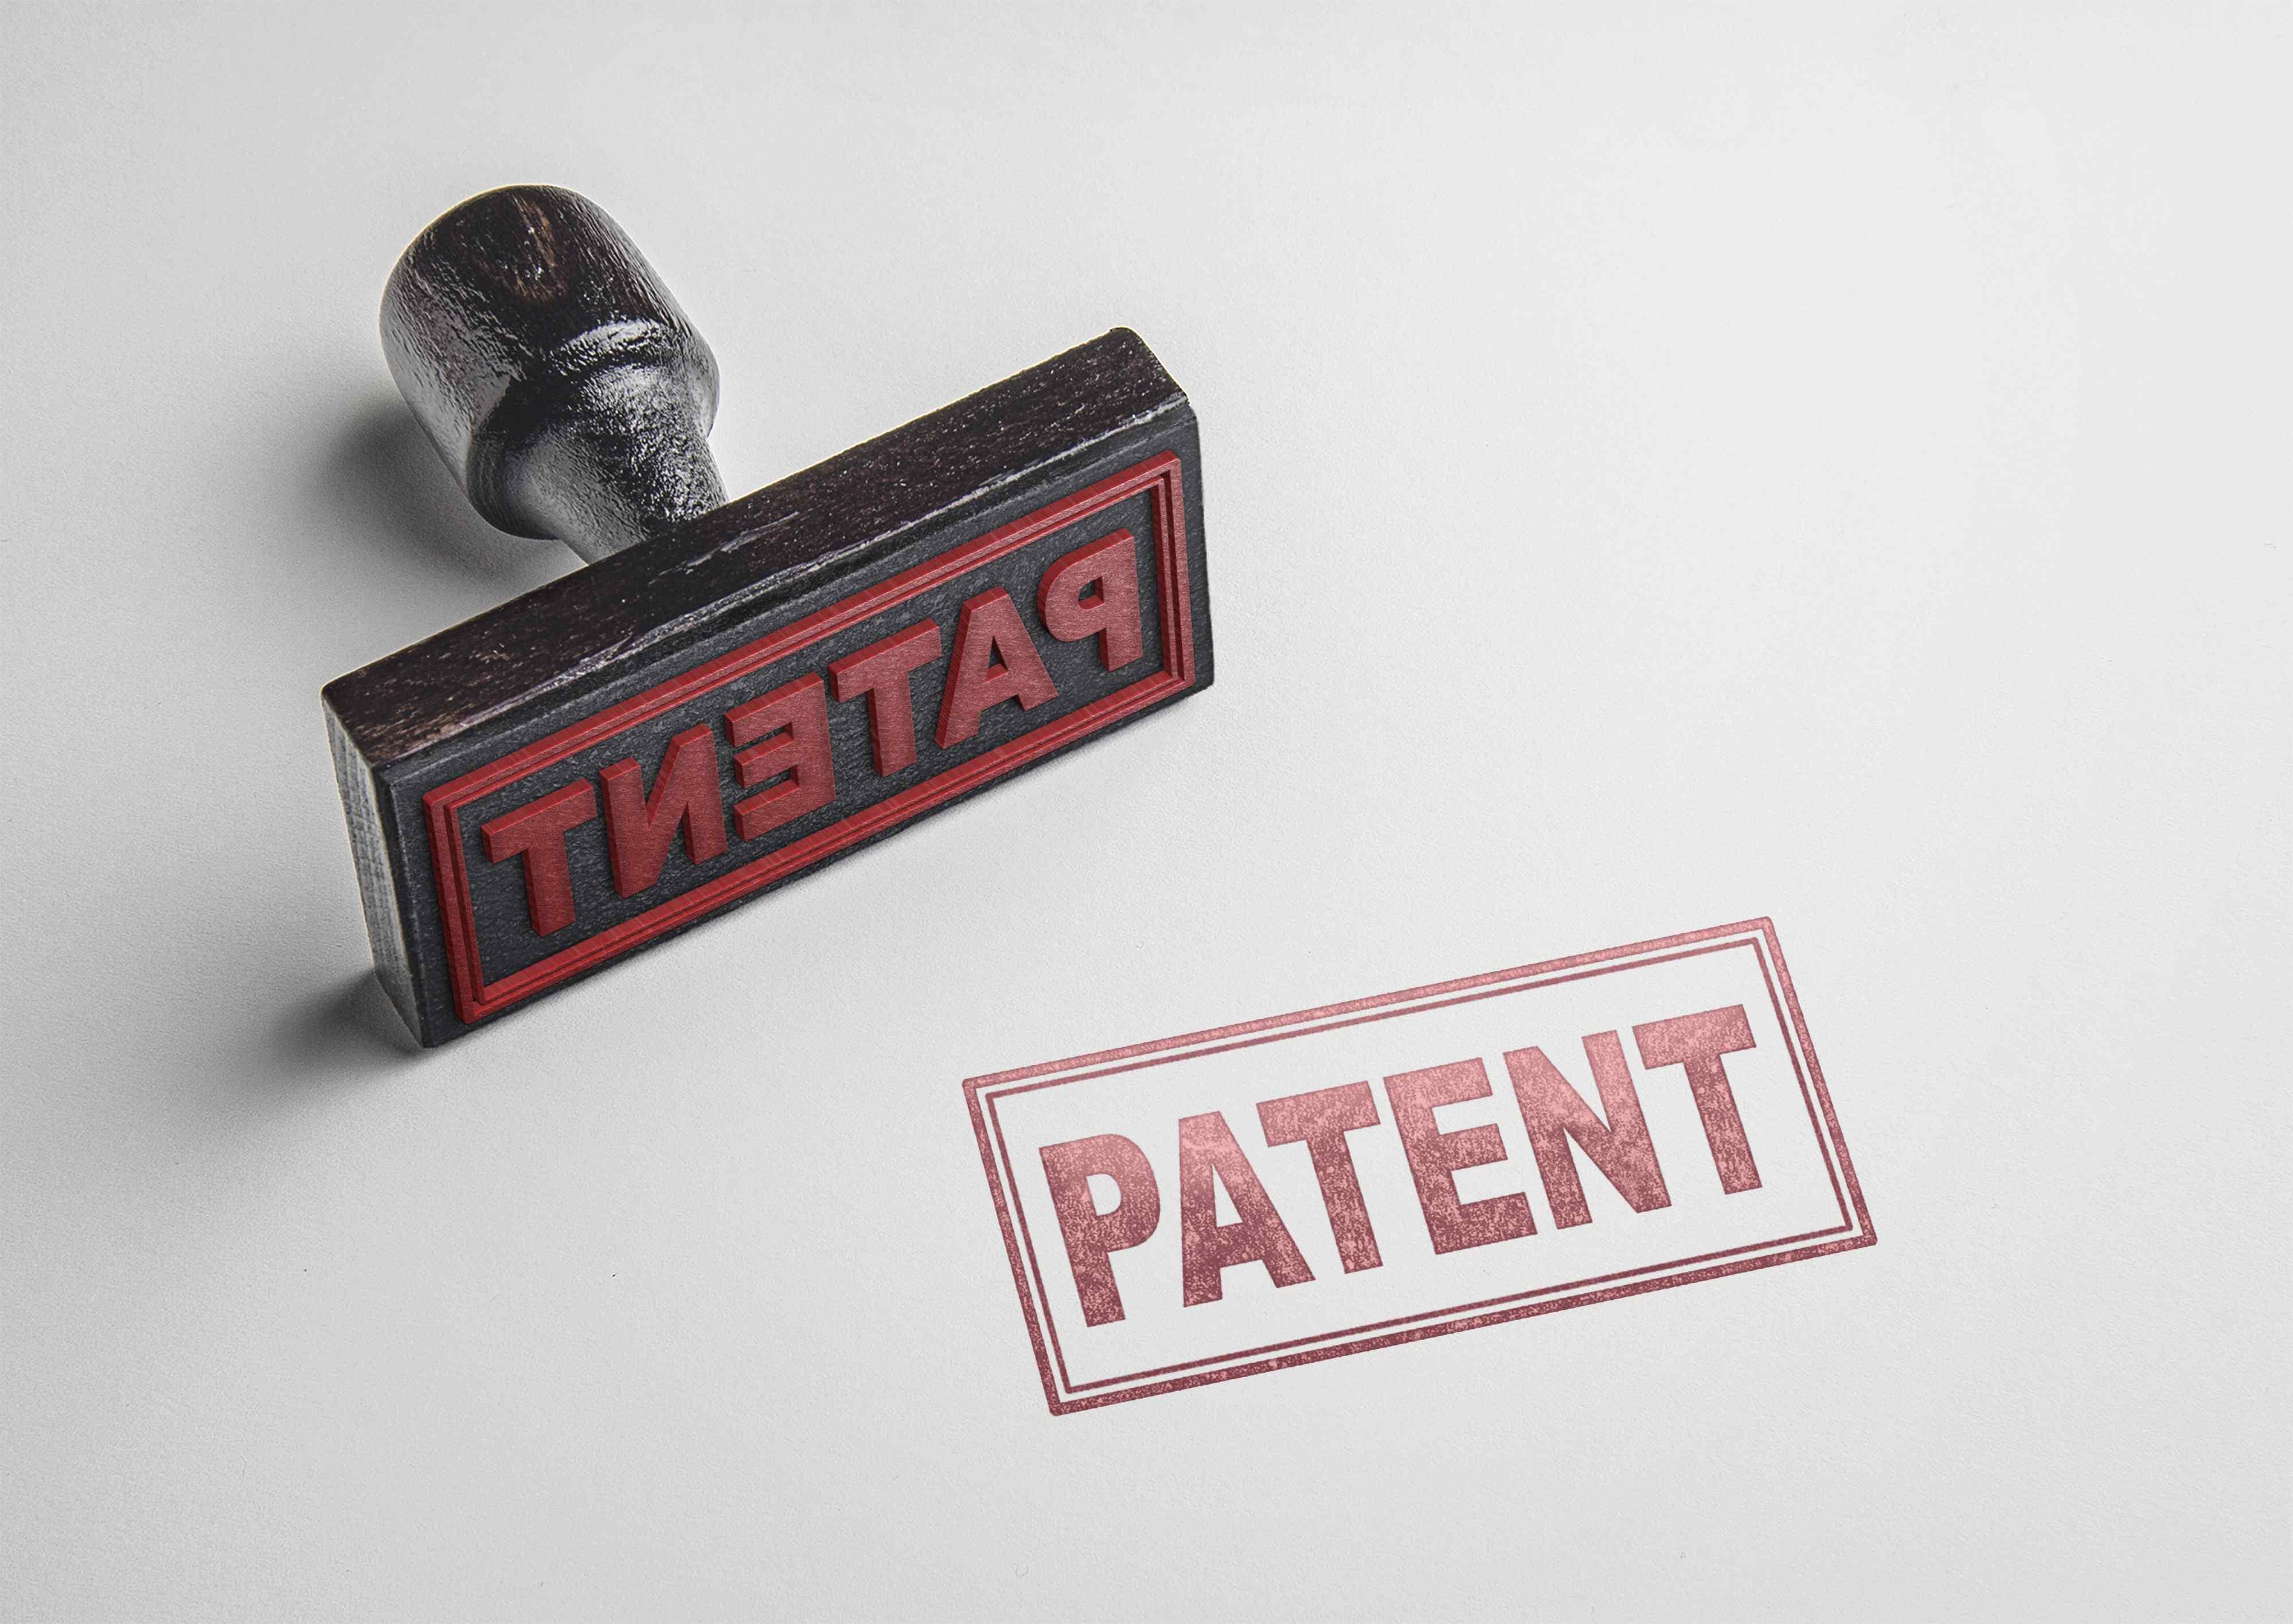 US patent granted for Tumorad®